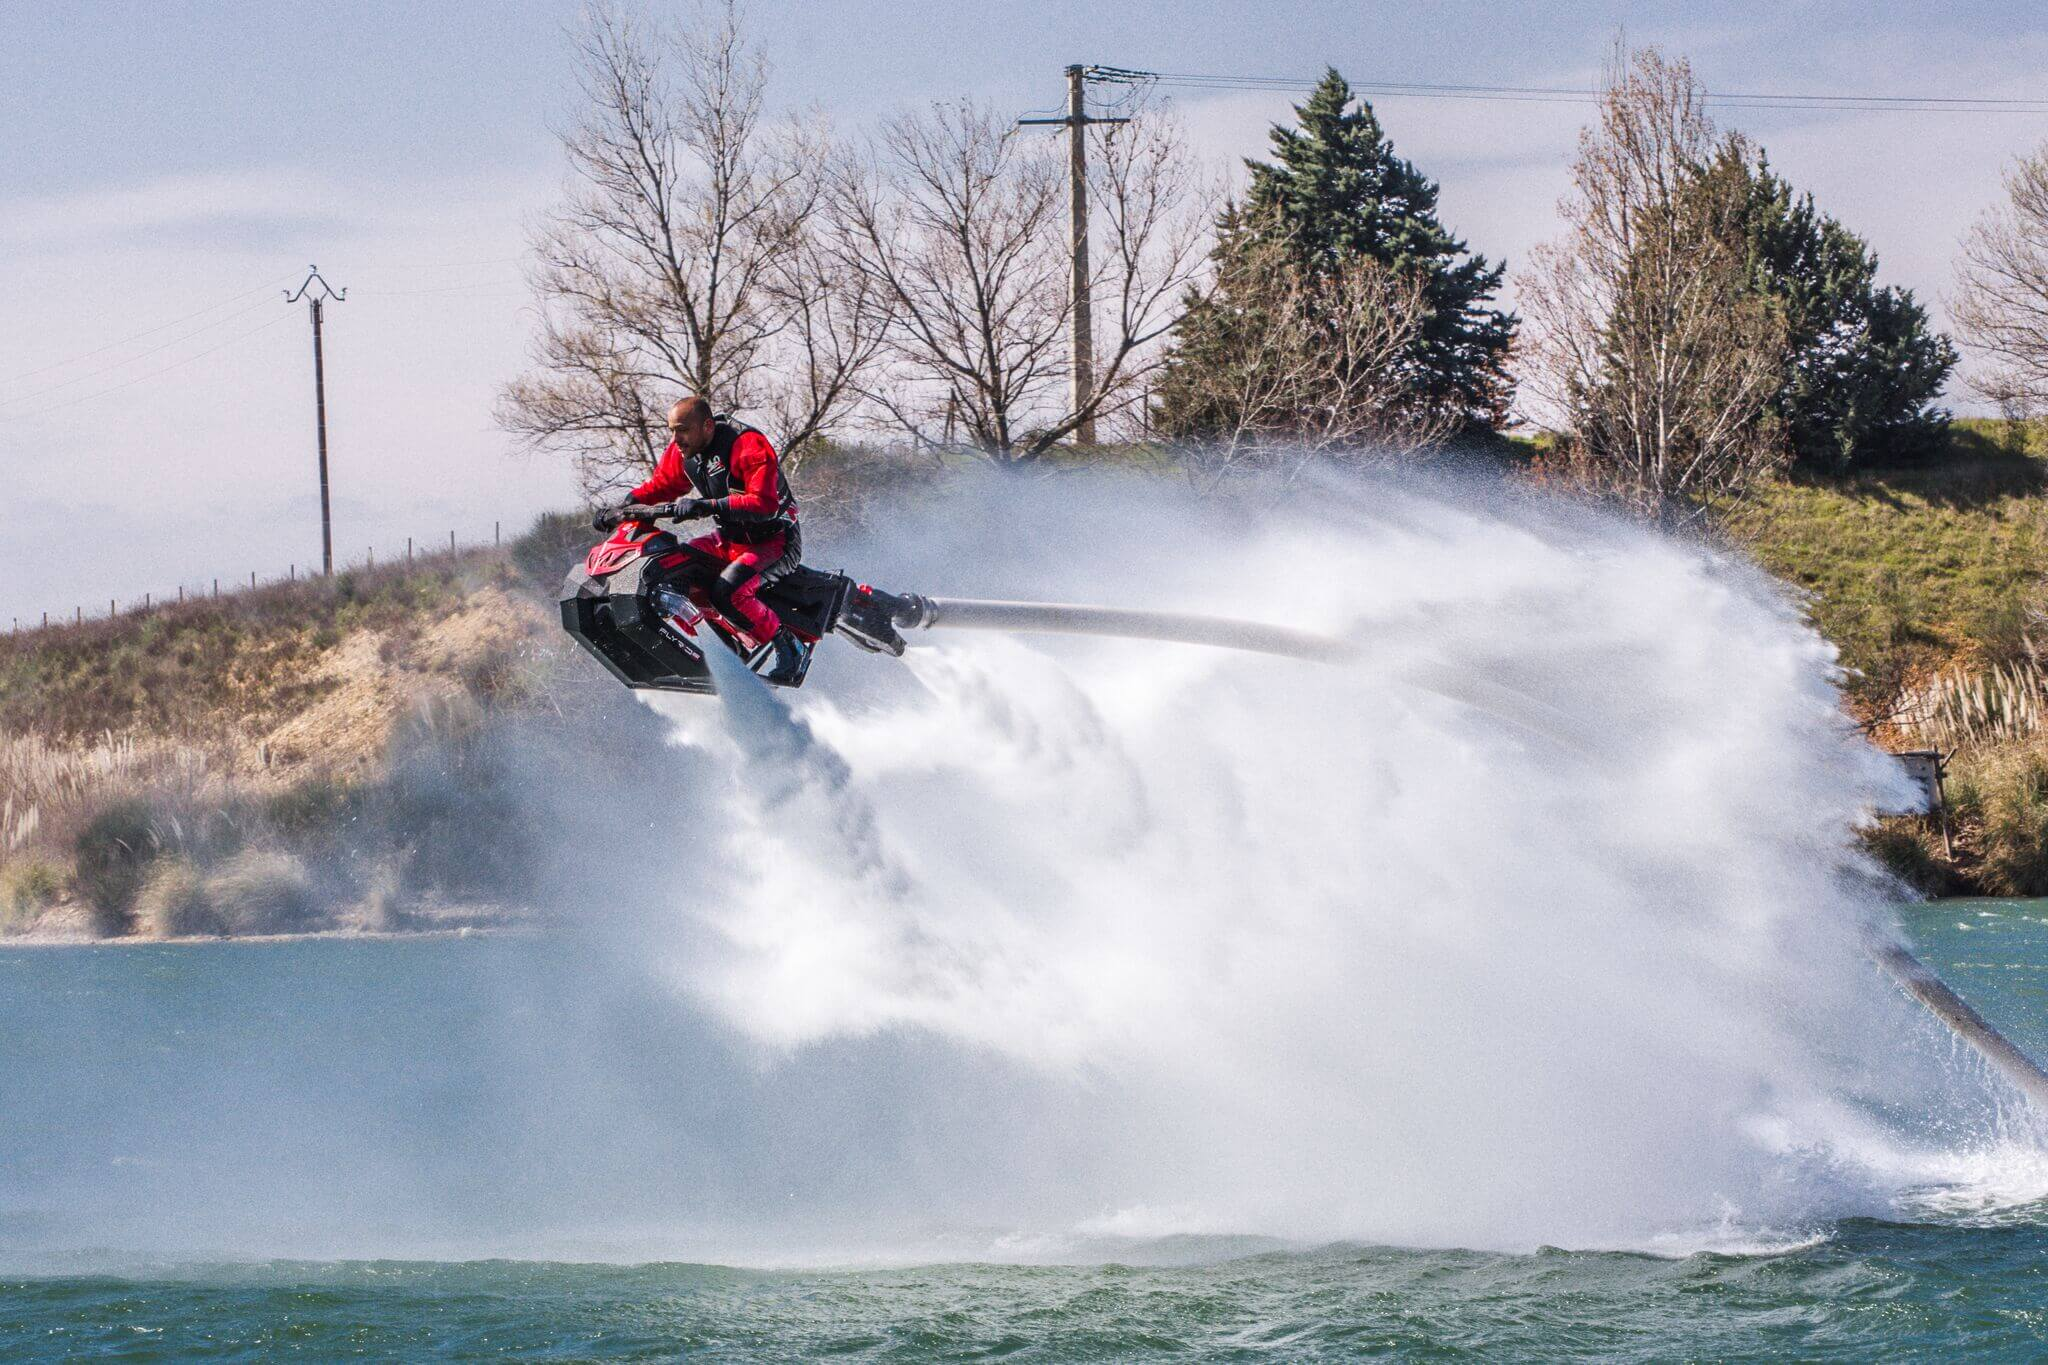 Flyride - latający skuter wodny